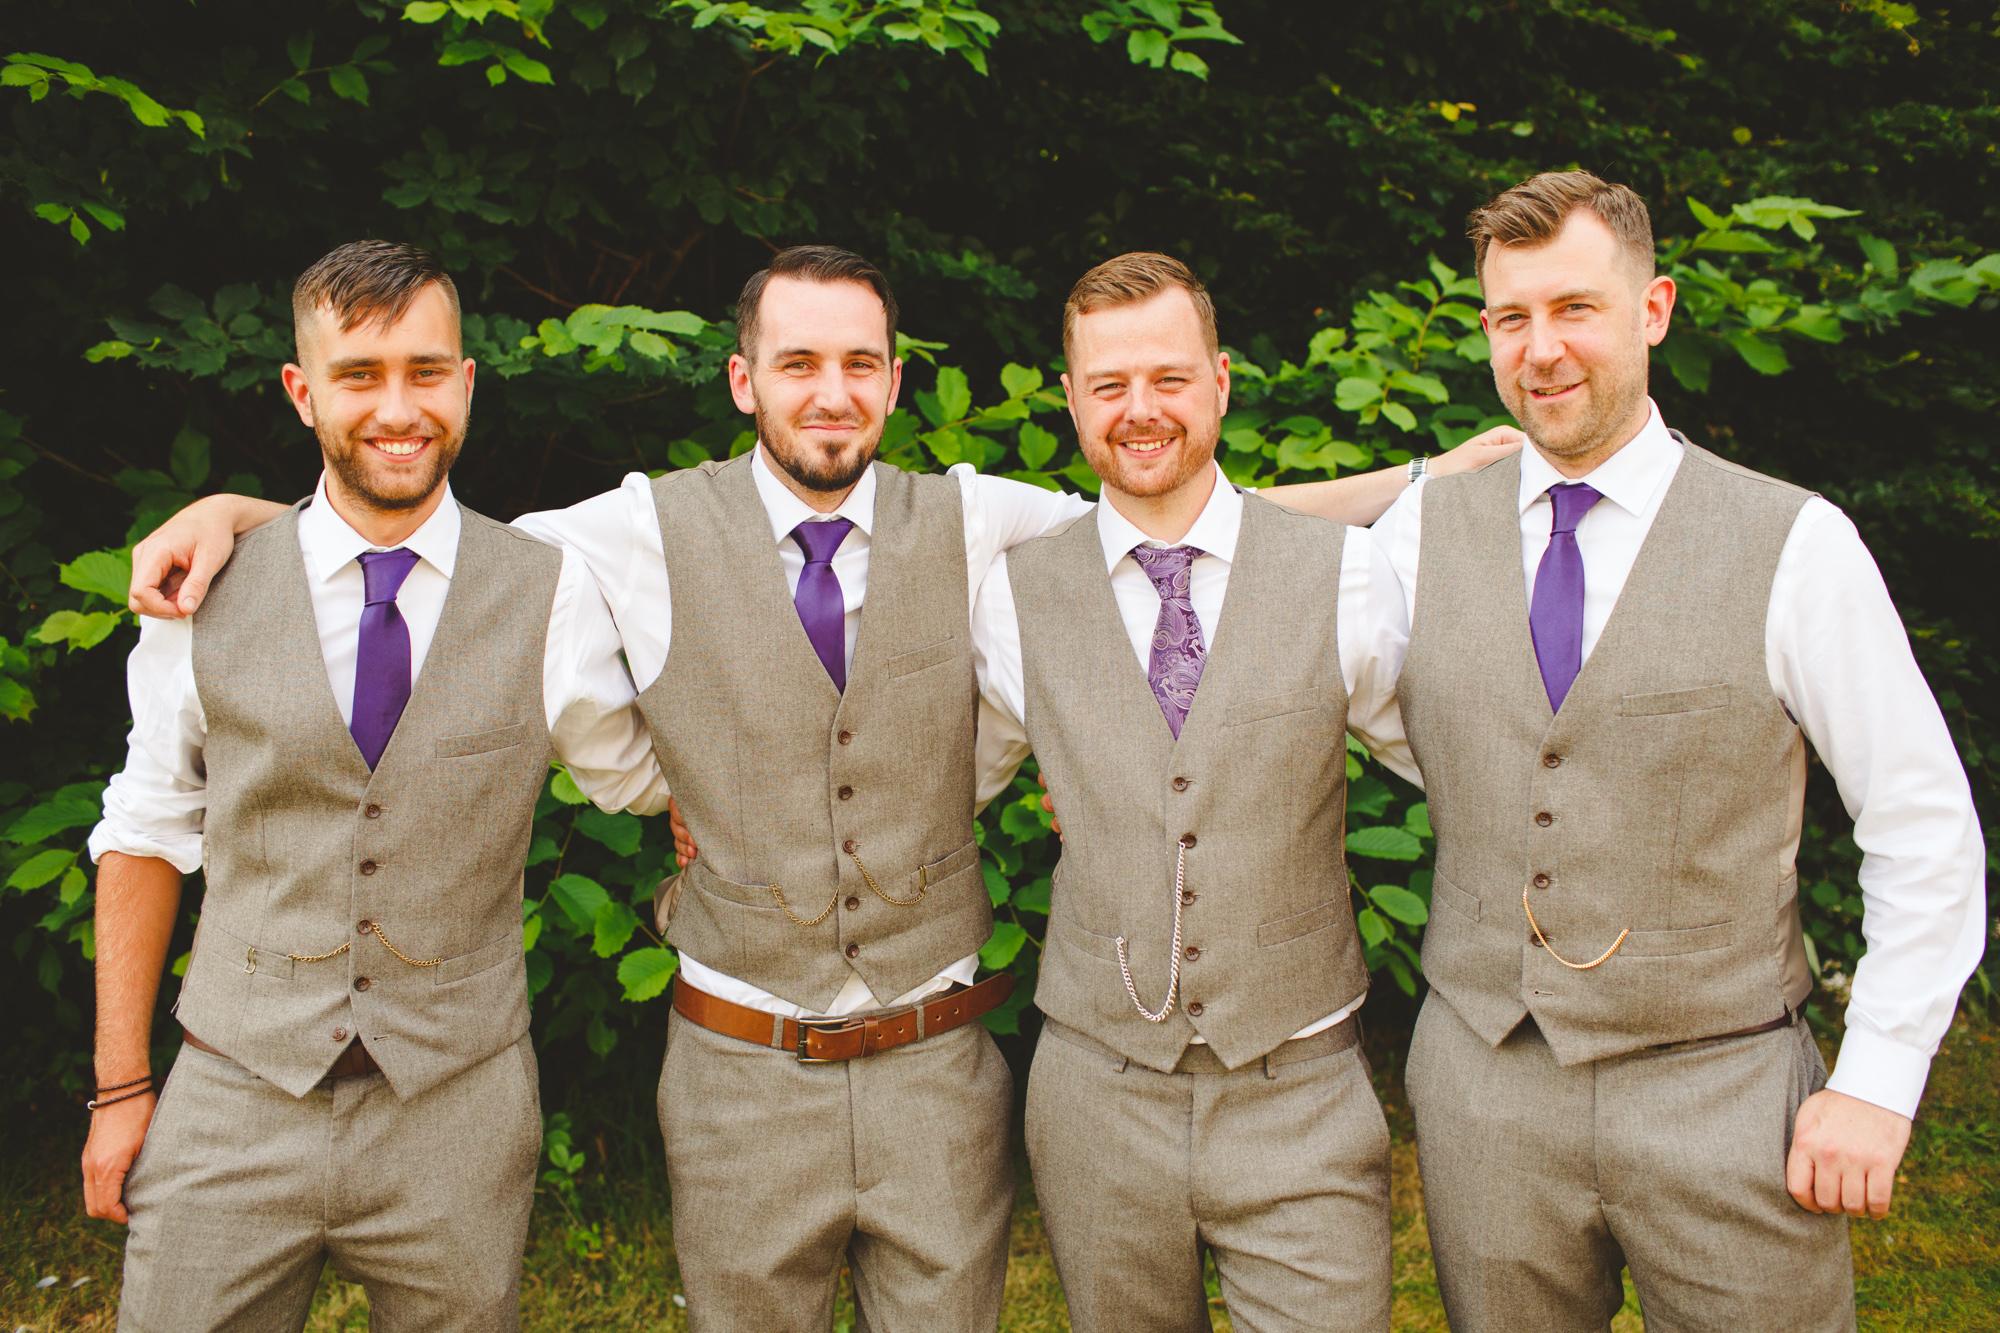 liverpool-town-hall-wedding-photography-17.jpg